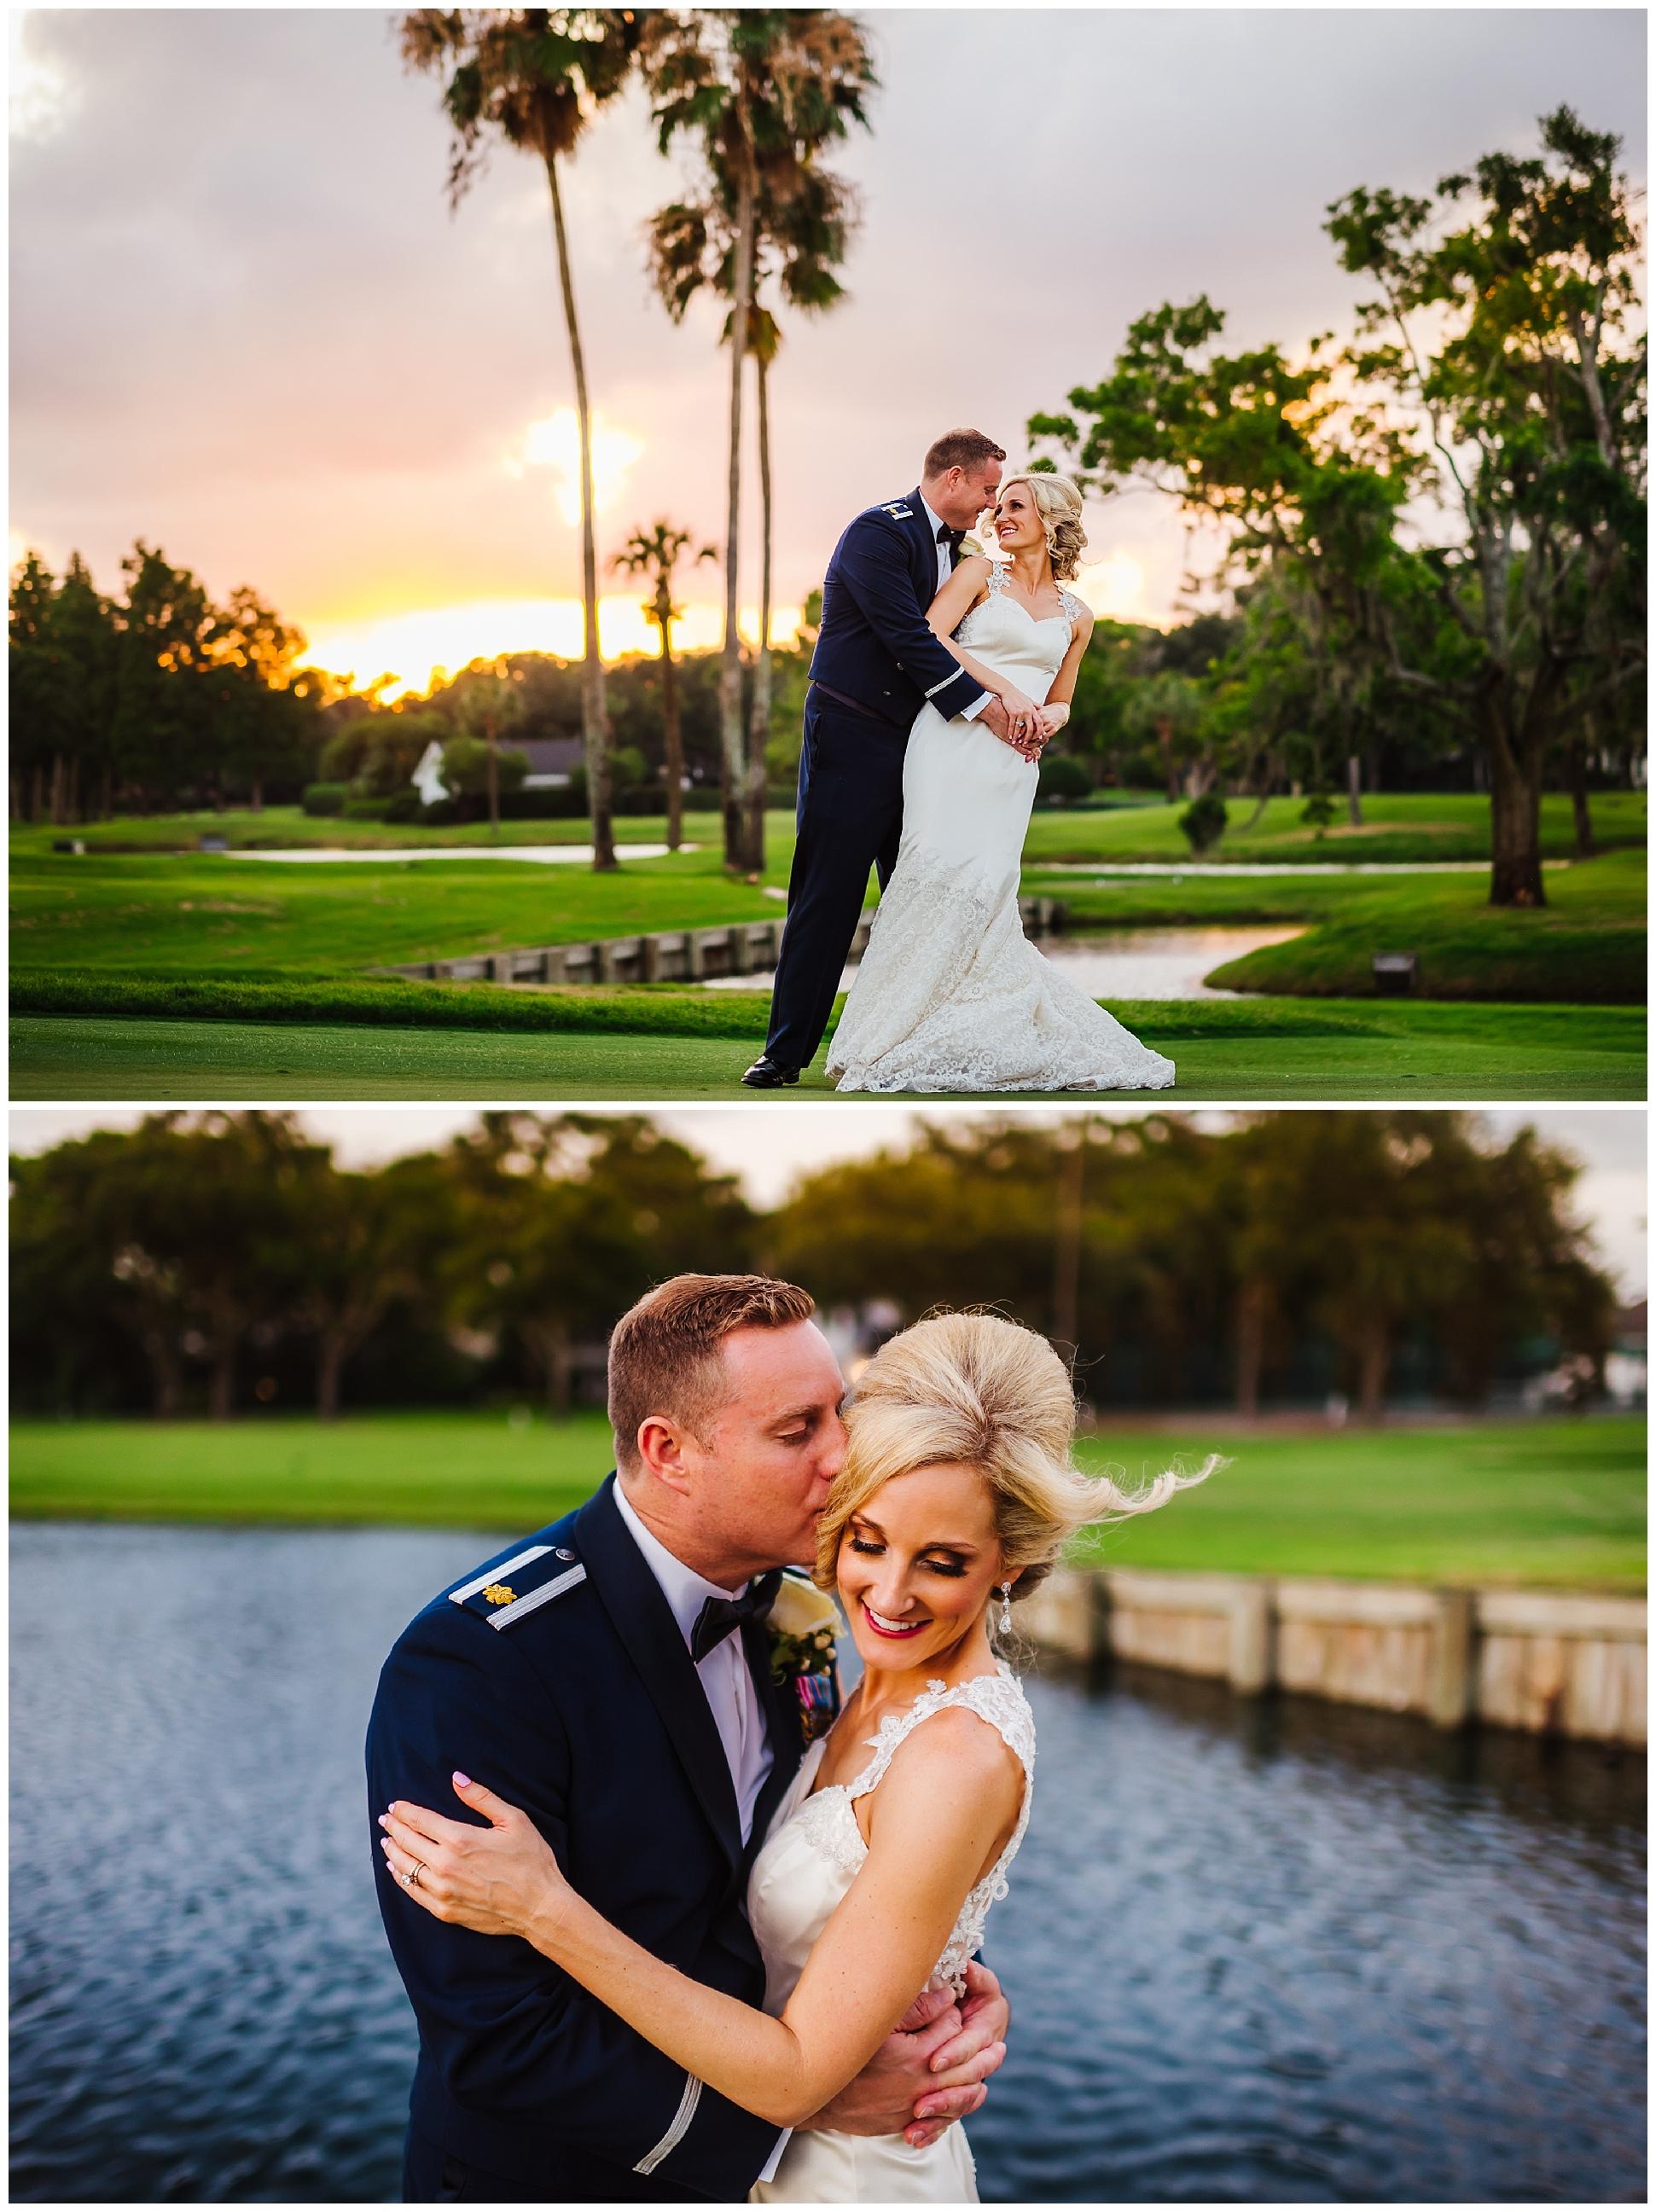 tampa-wedding-photographer-sleeves-palma-ceia-country-club-golf-course-sunset-luxury_0102.jpg